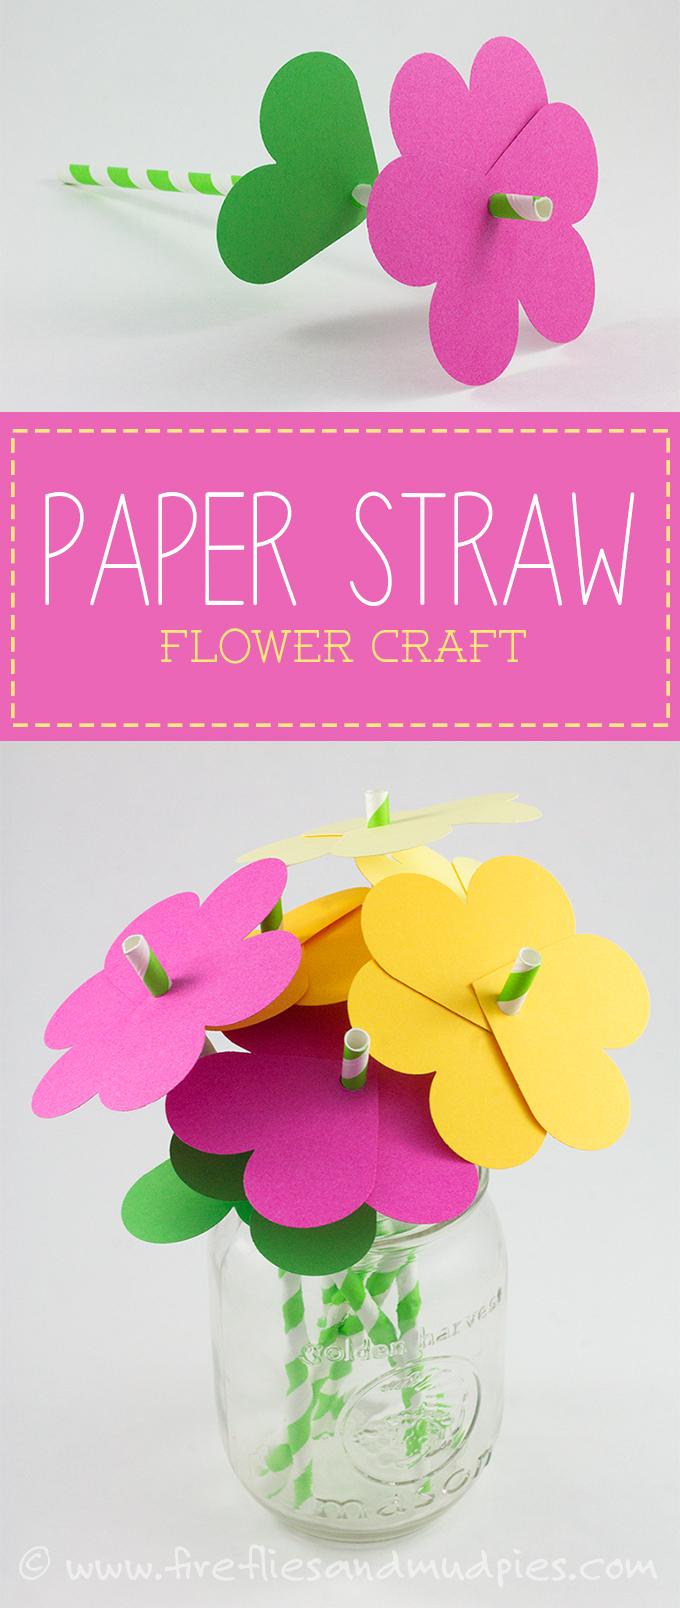 Paper Straw Flowers.